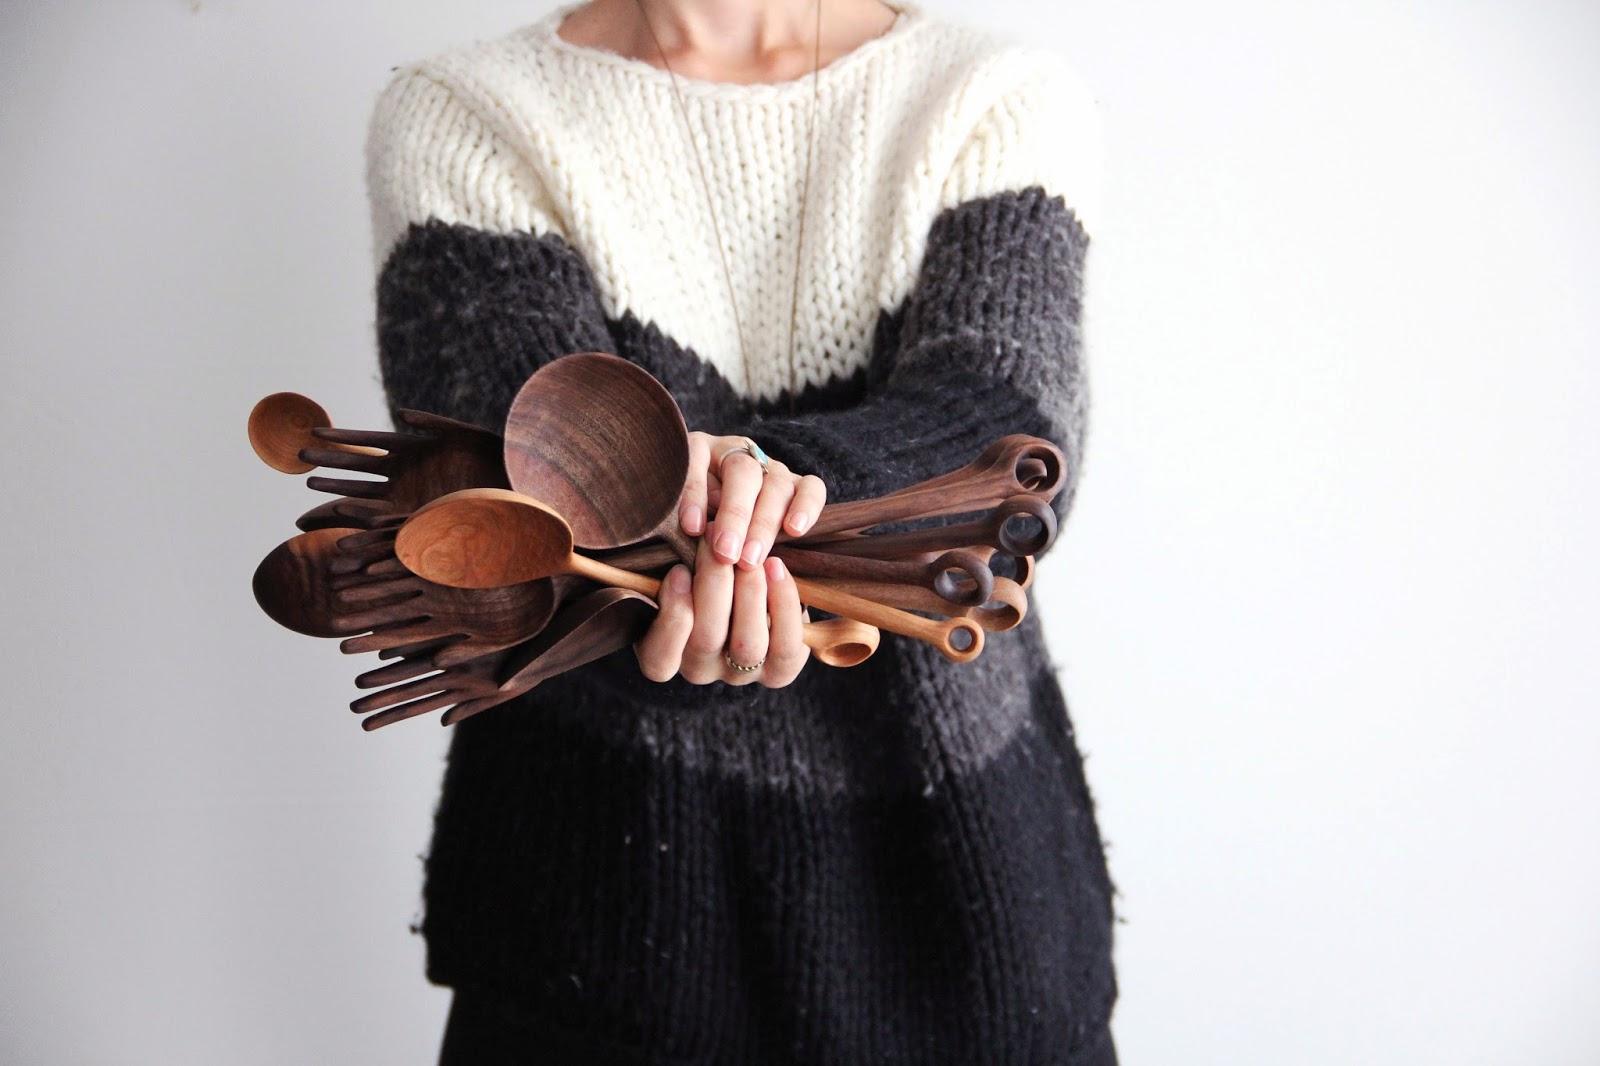 ariele_alasko_handcarved_spoons_05